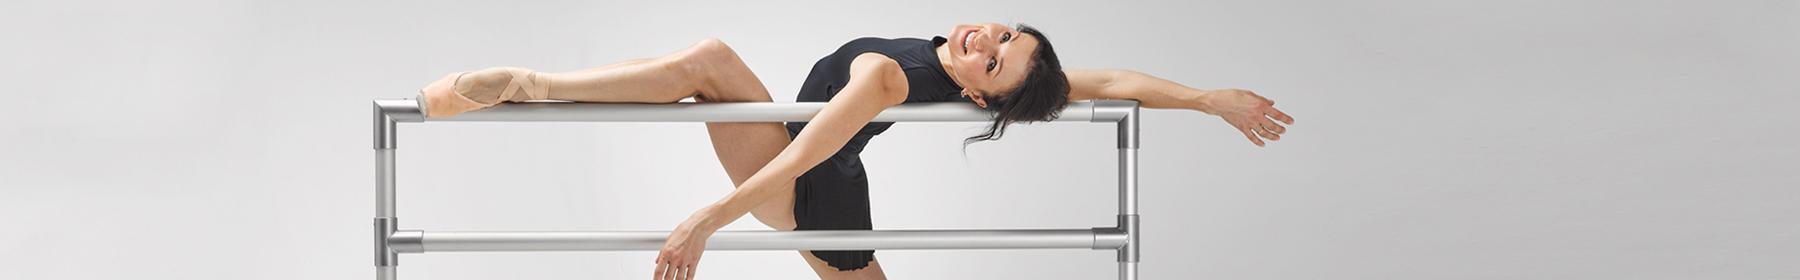 custom-barres-freestanding-ballet-barre-banner